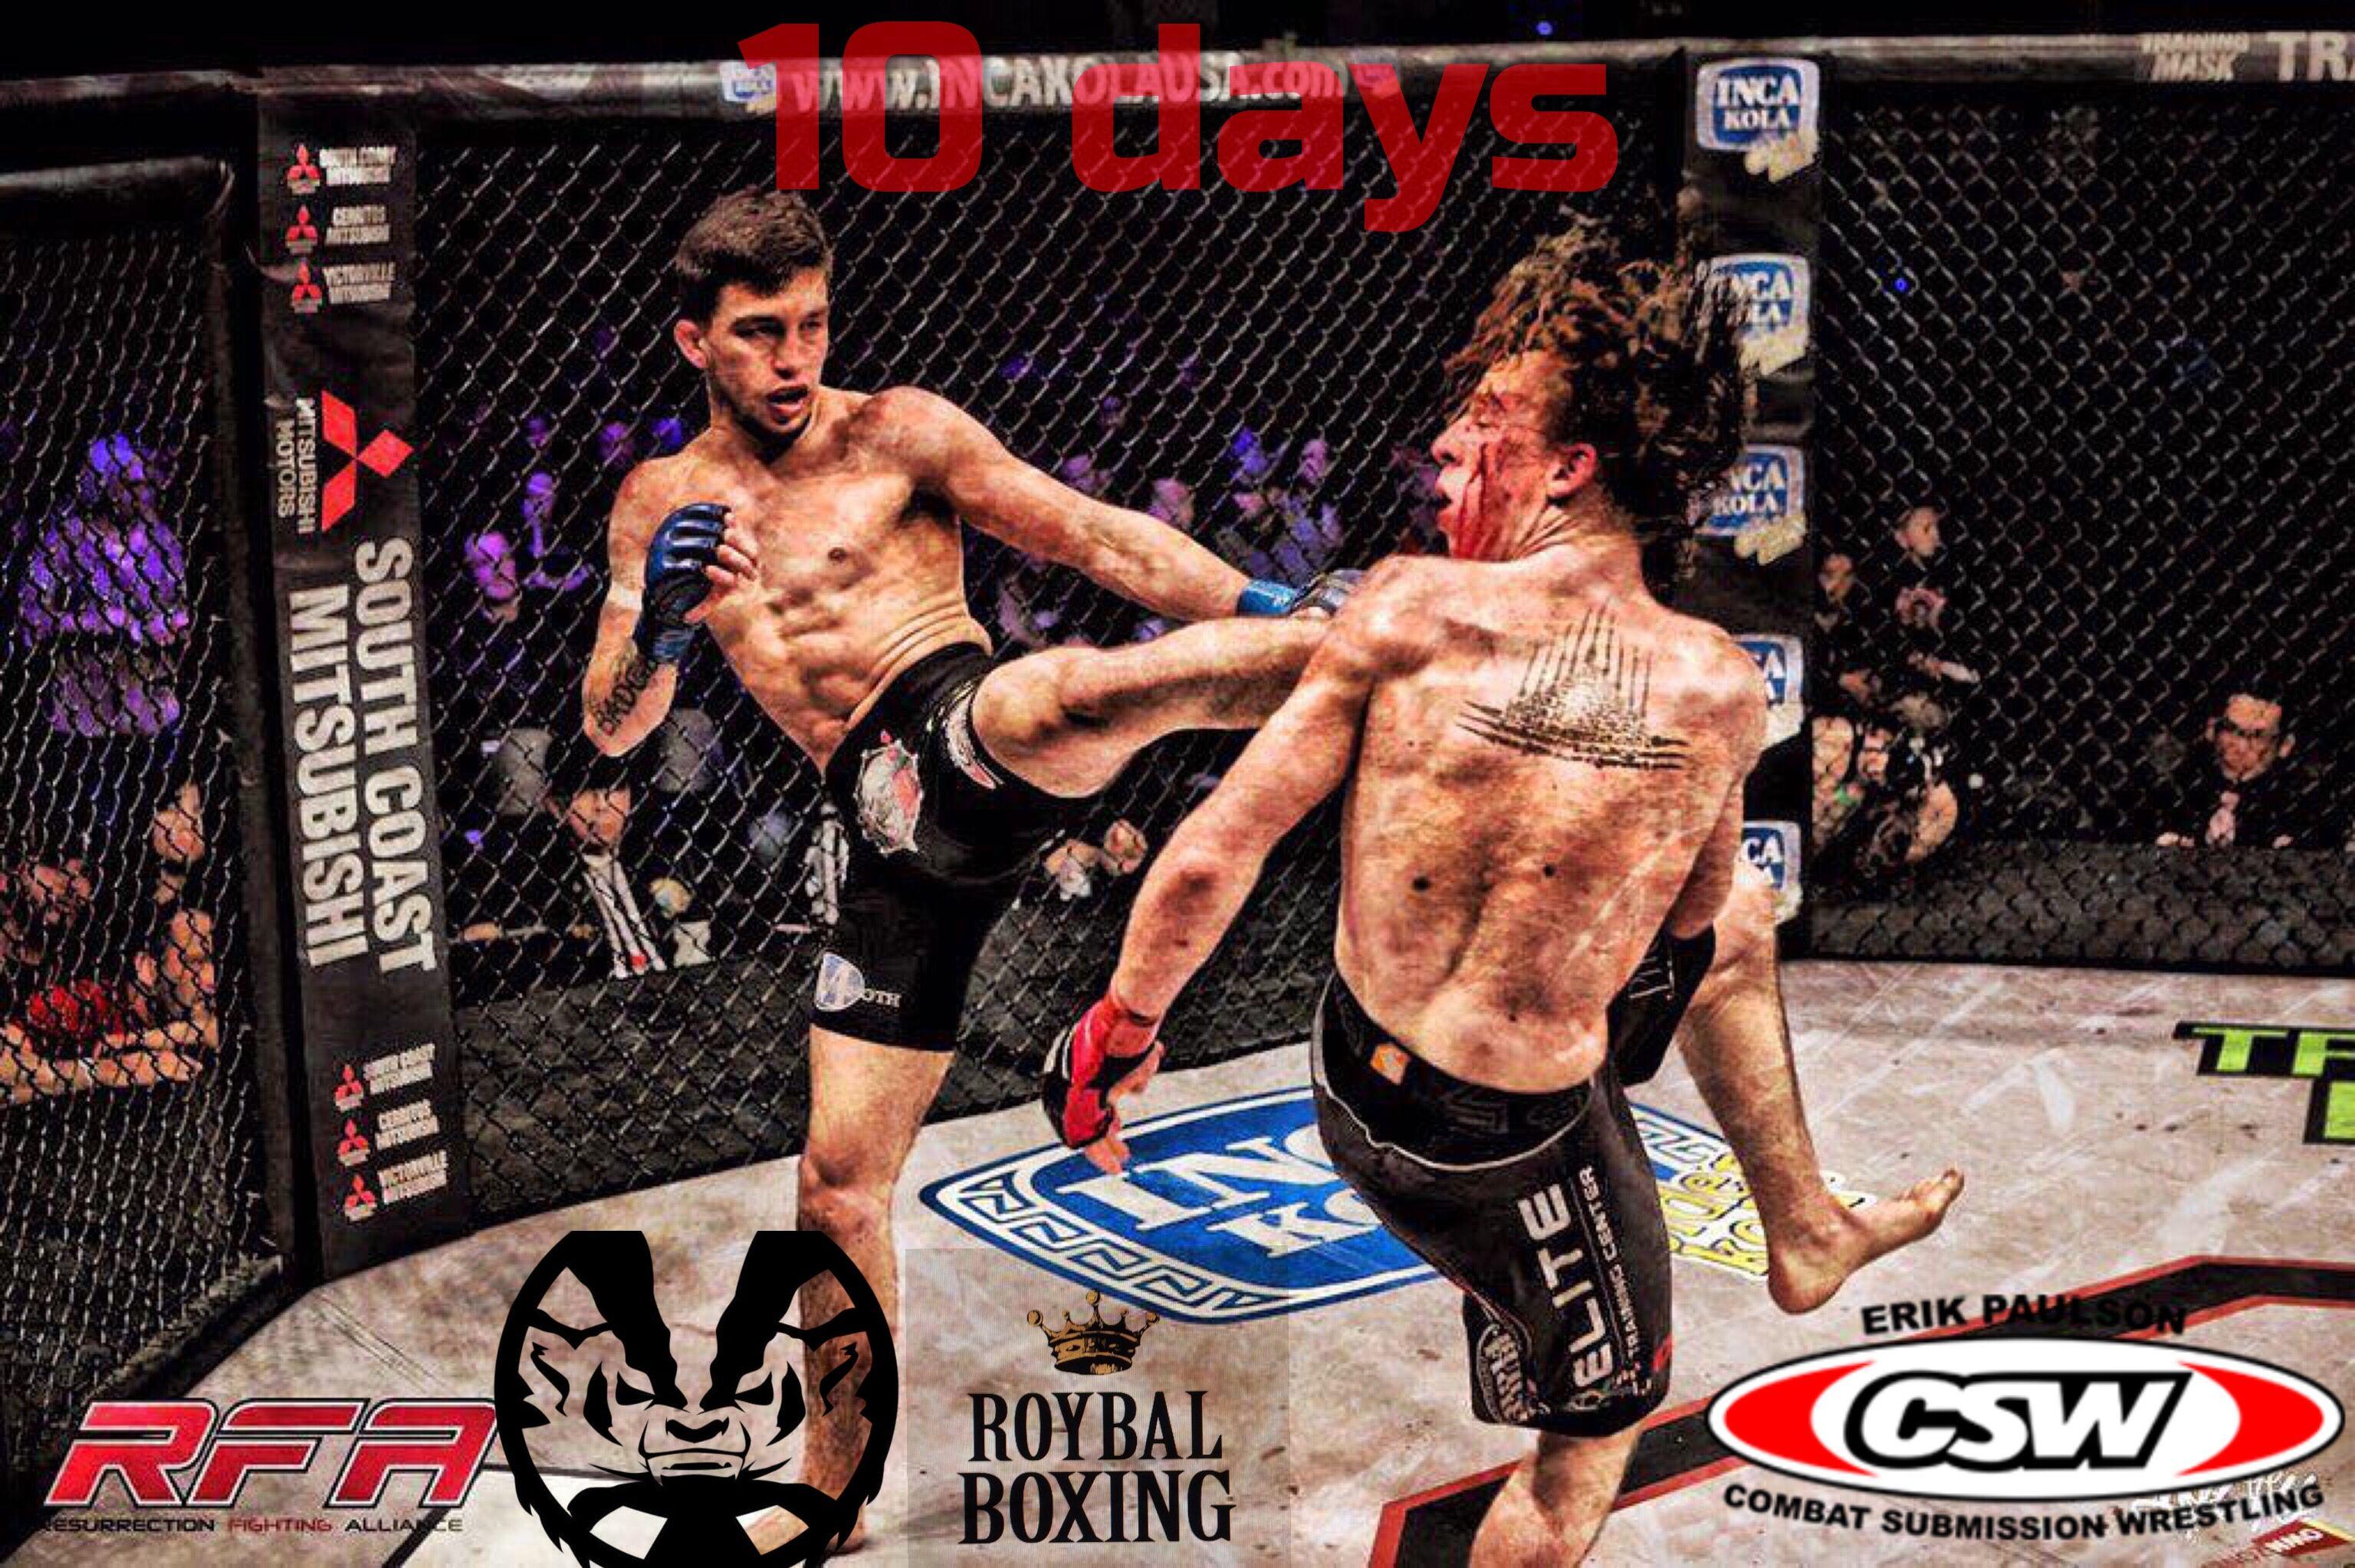 Jacob Rosales Ben Jones Csw Stx Kickboxing Muay Thai Jiu Jitsu Gym Mma Gym Kickboxing Classes